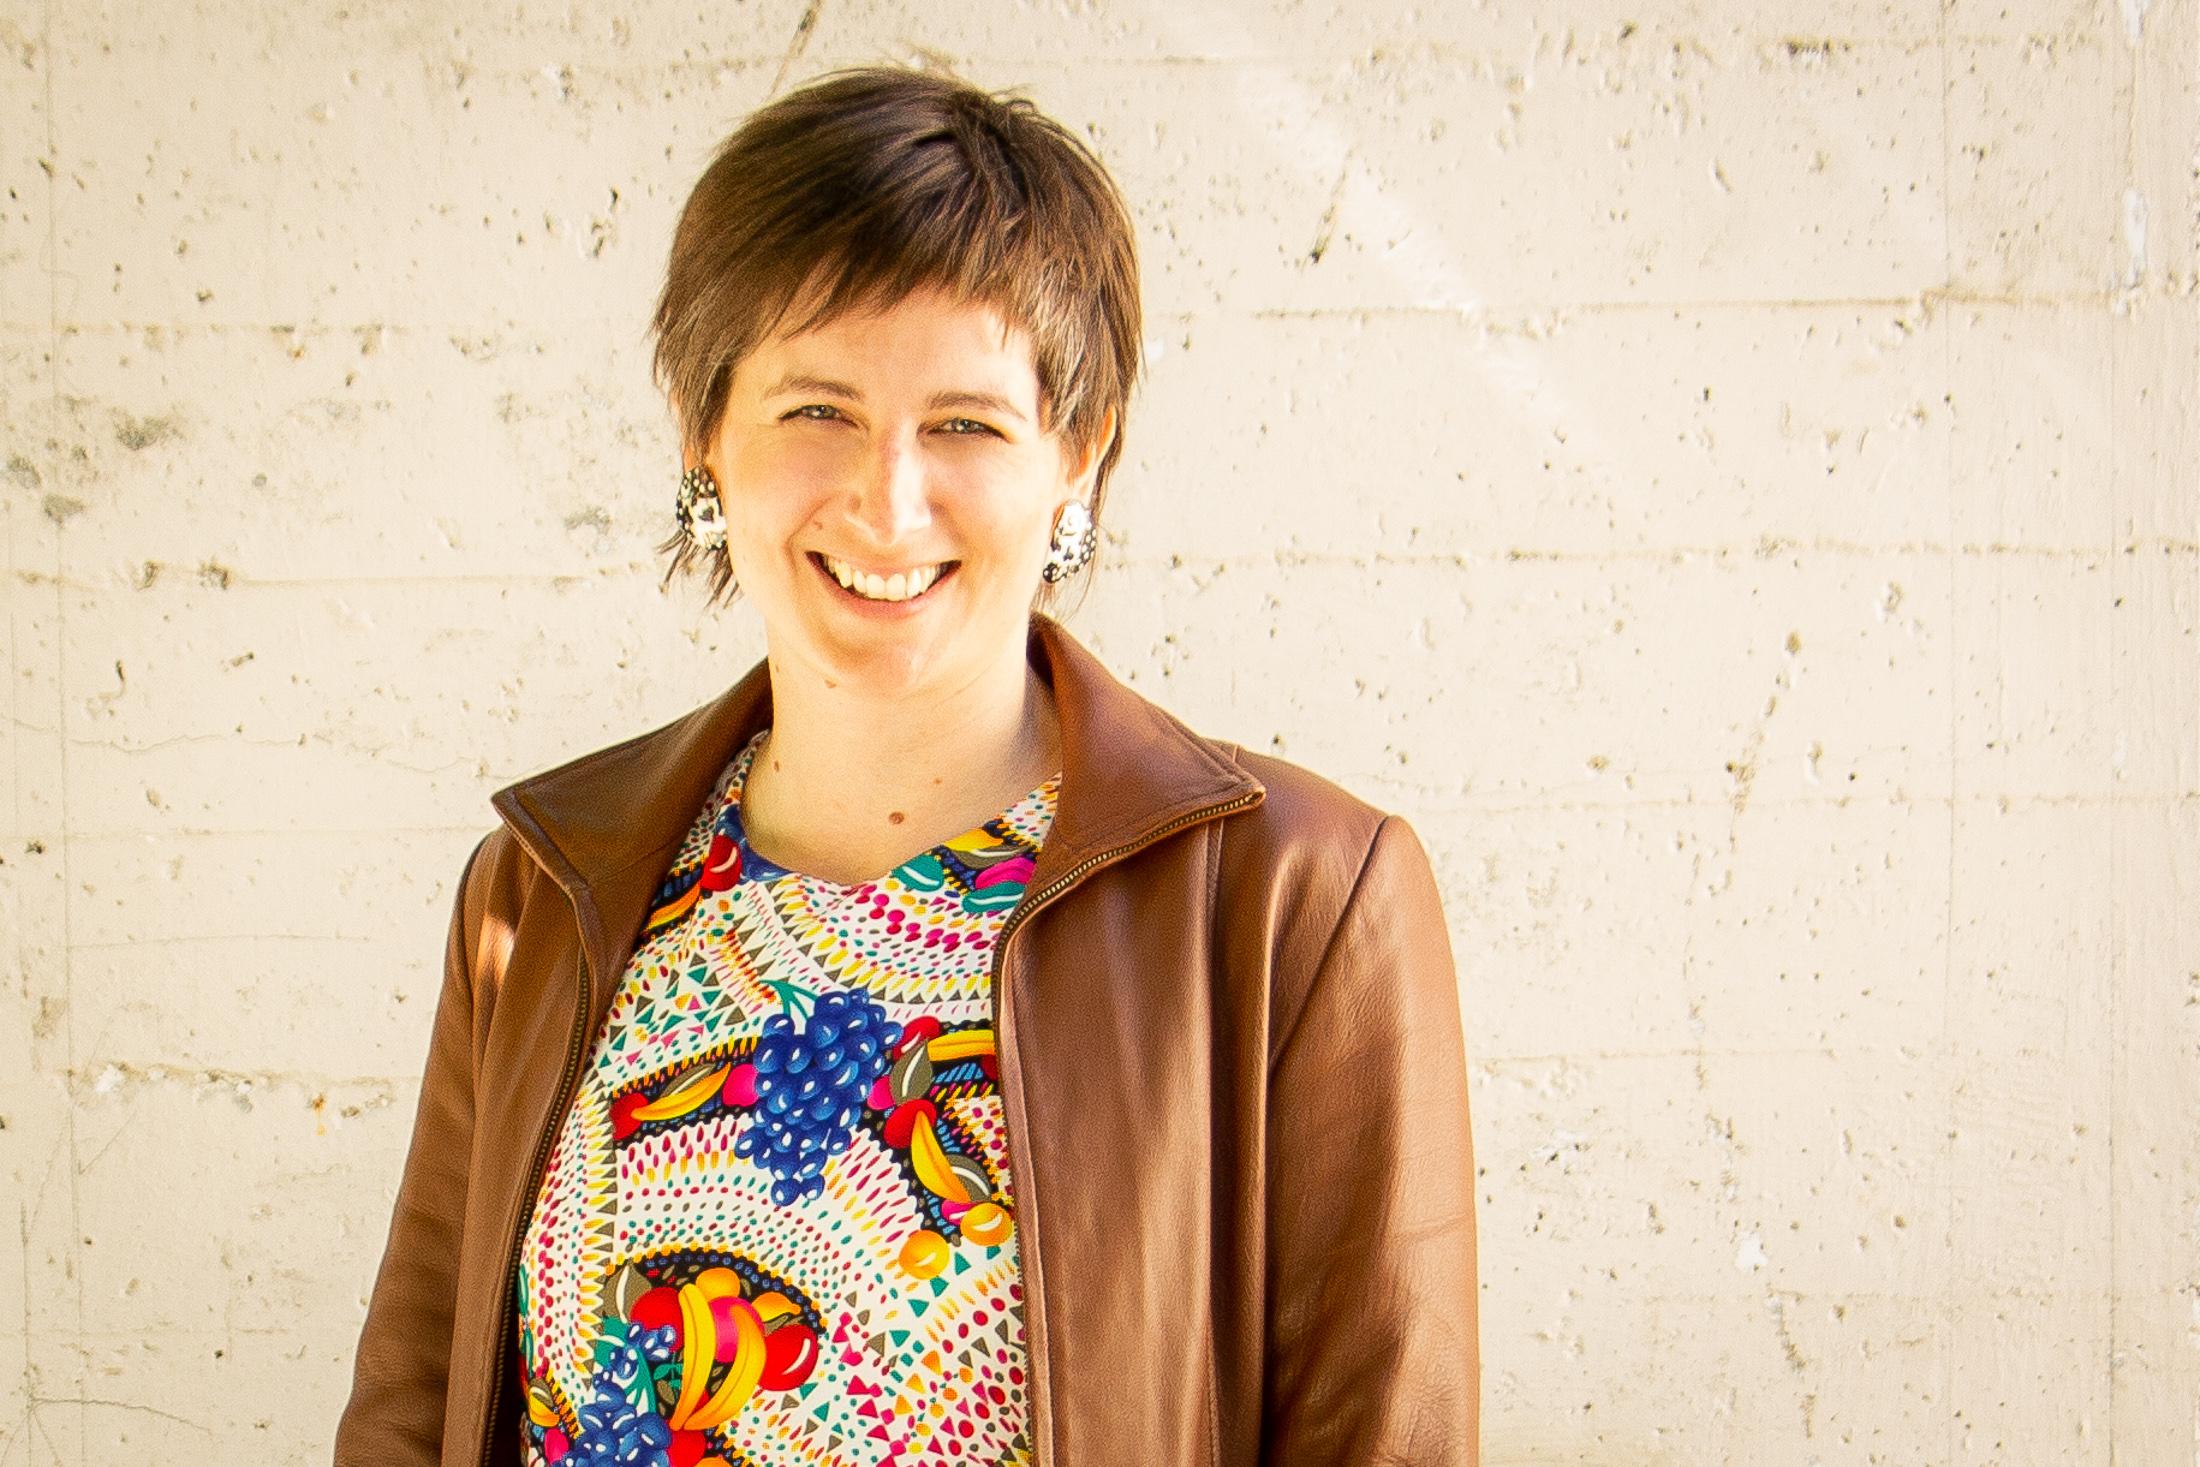 Bonnie Obremski - Storyborne and FemPowered Founder, Lead Facilitator